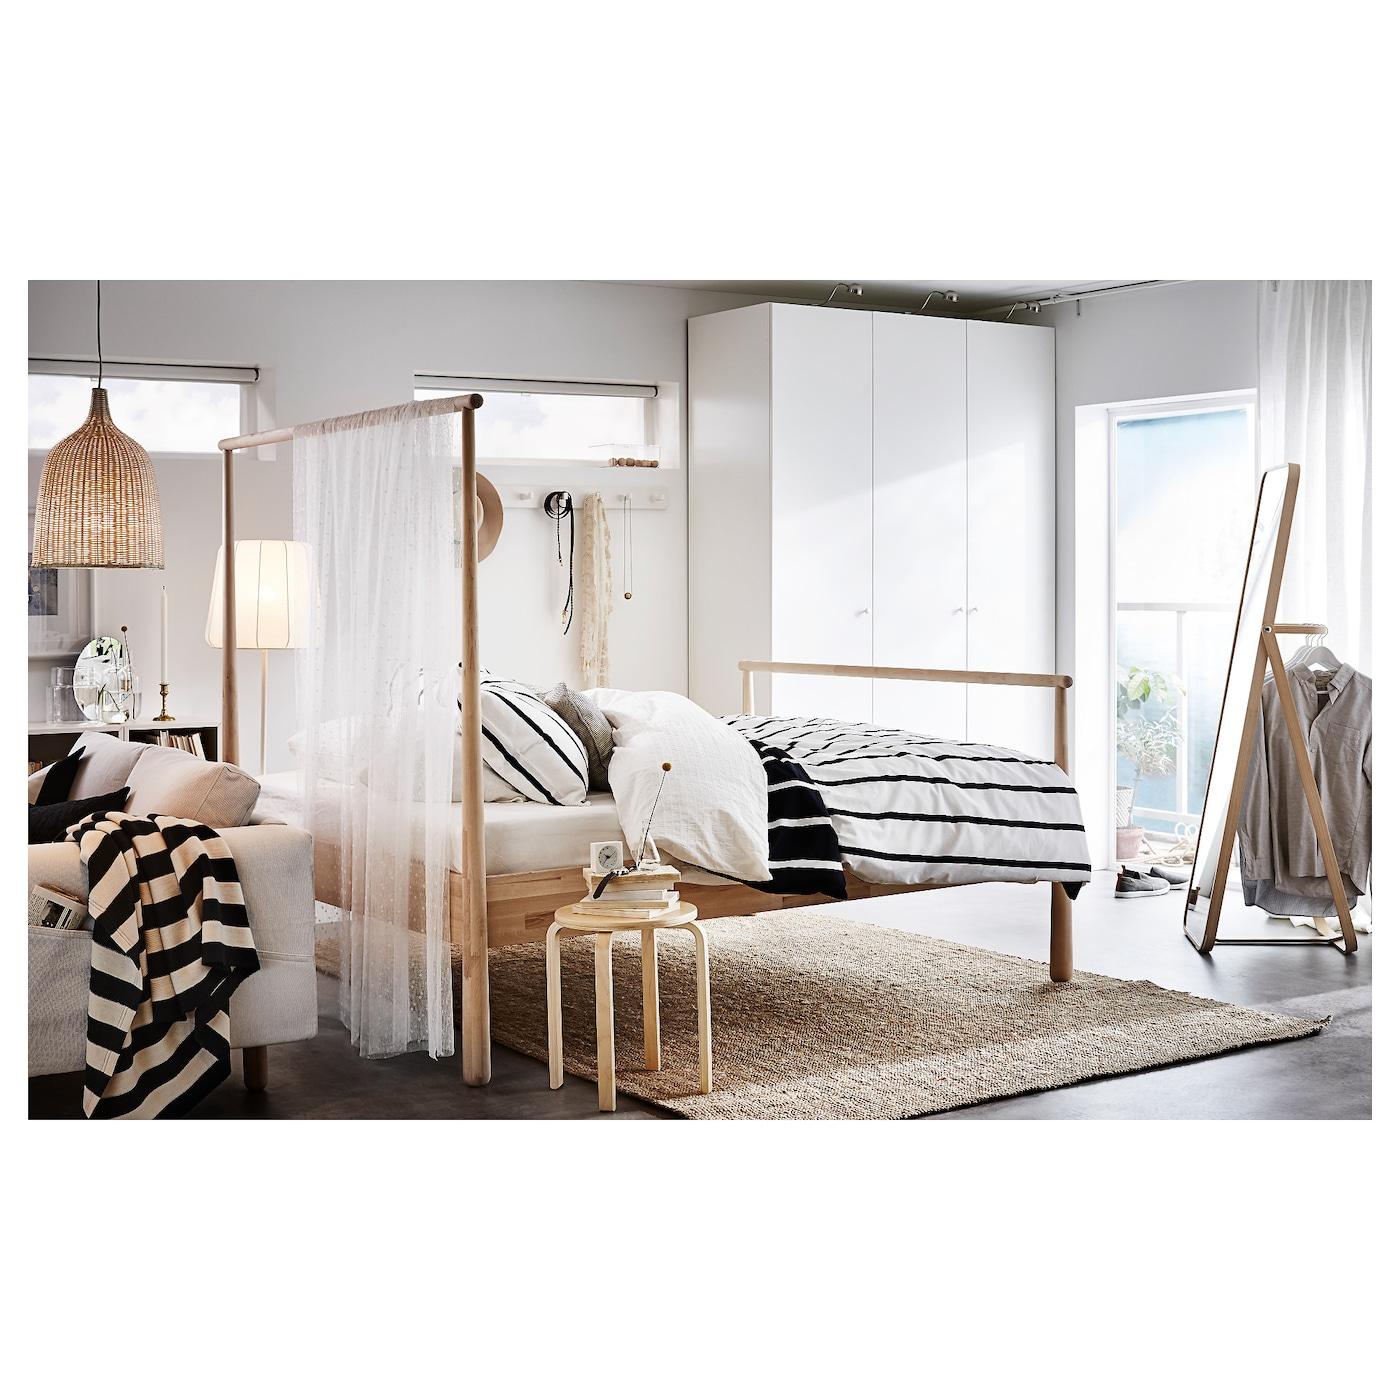 ikornnes miroir sur pied fr ne 52 x 167 cm ikea. Black Bedroom Furniture Sets. Home Design Ideas